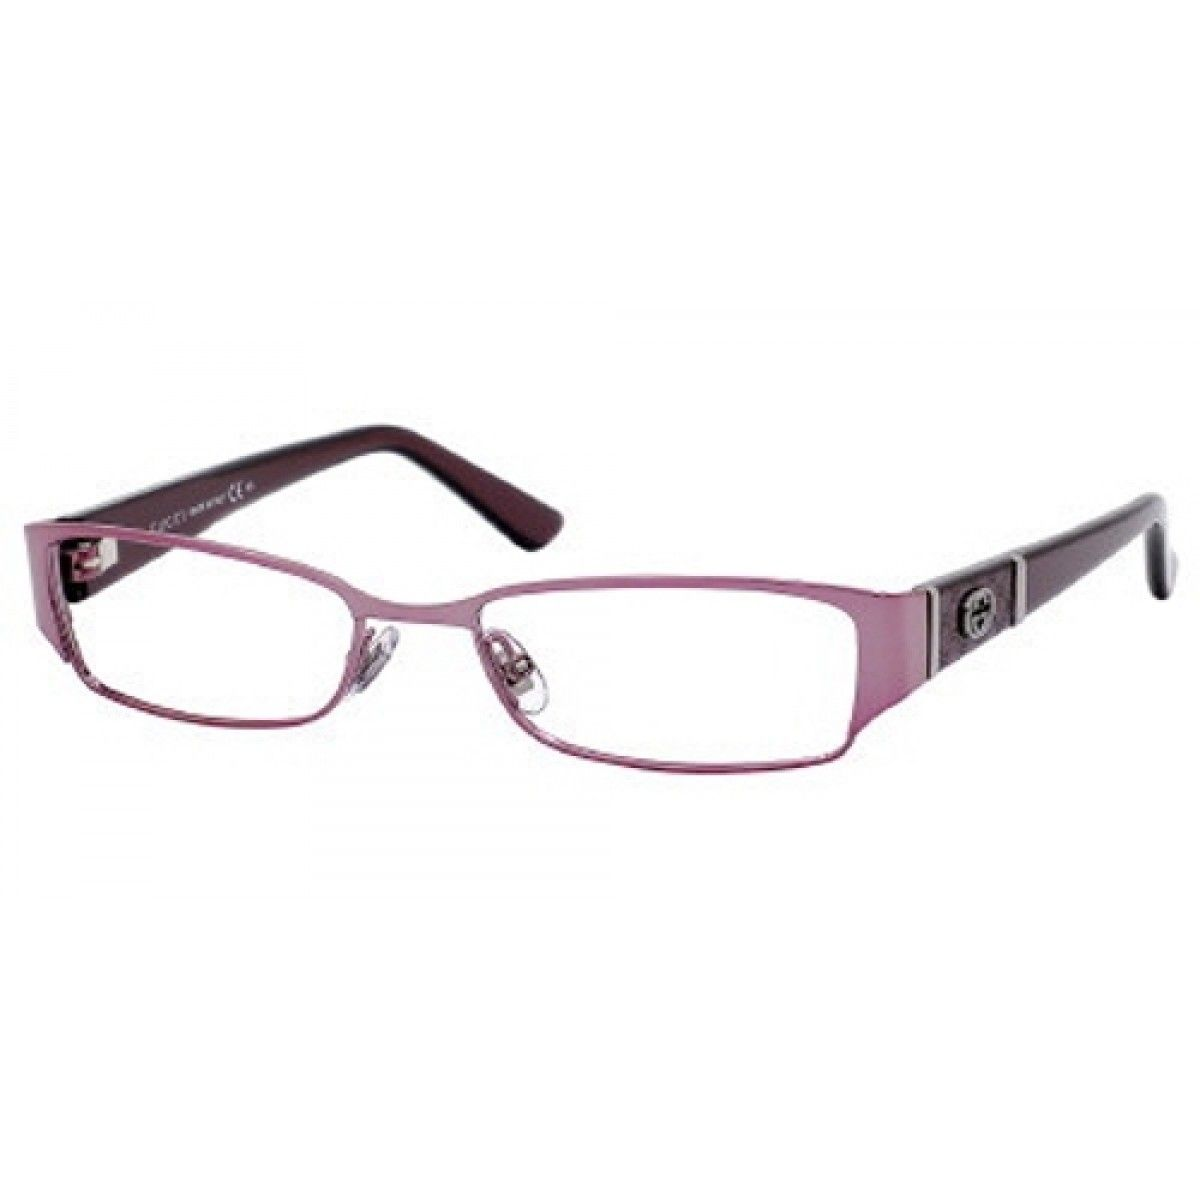 Gucci Eyewear Gucci GG2910 Eyeglasses, Pink Purple Frame ...